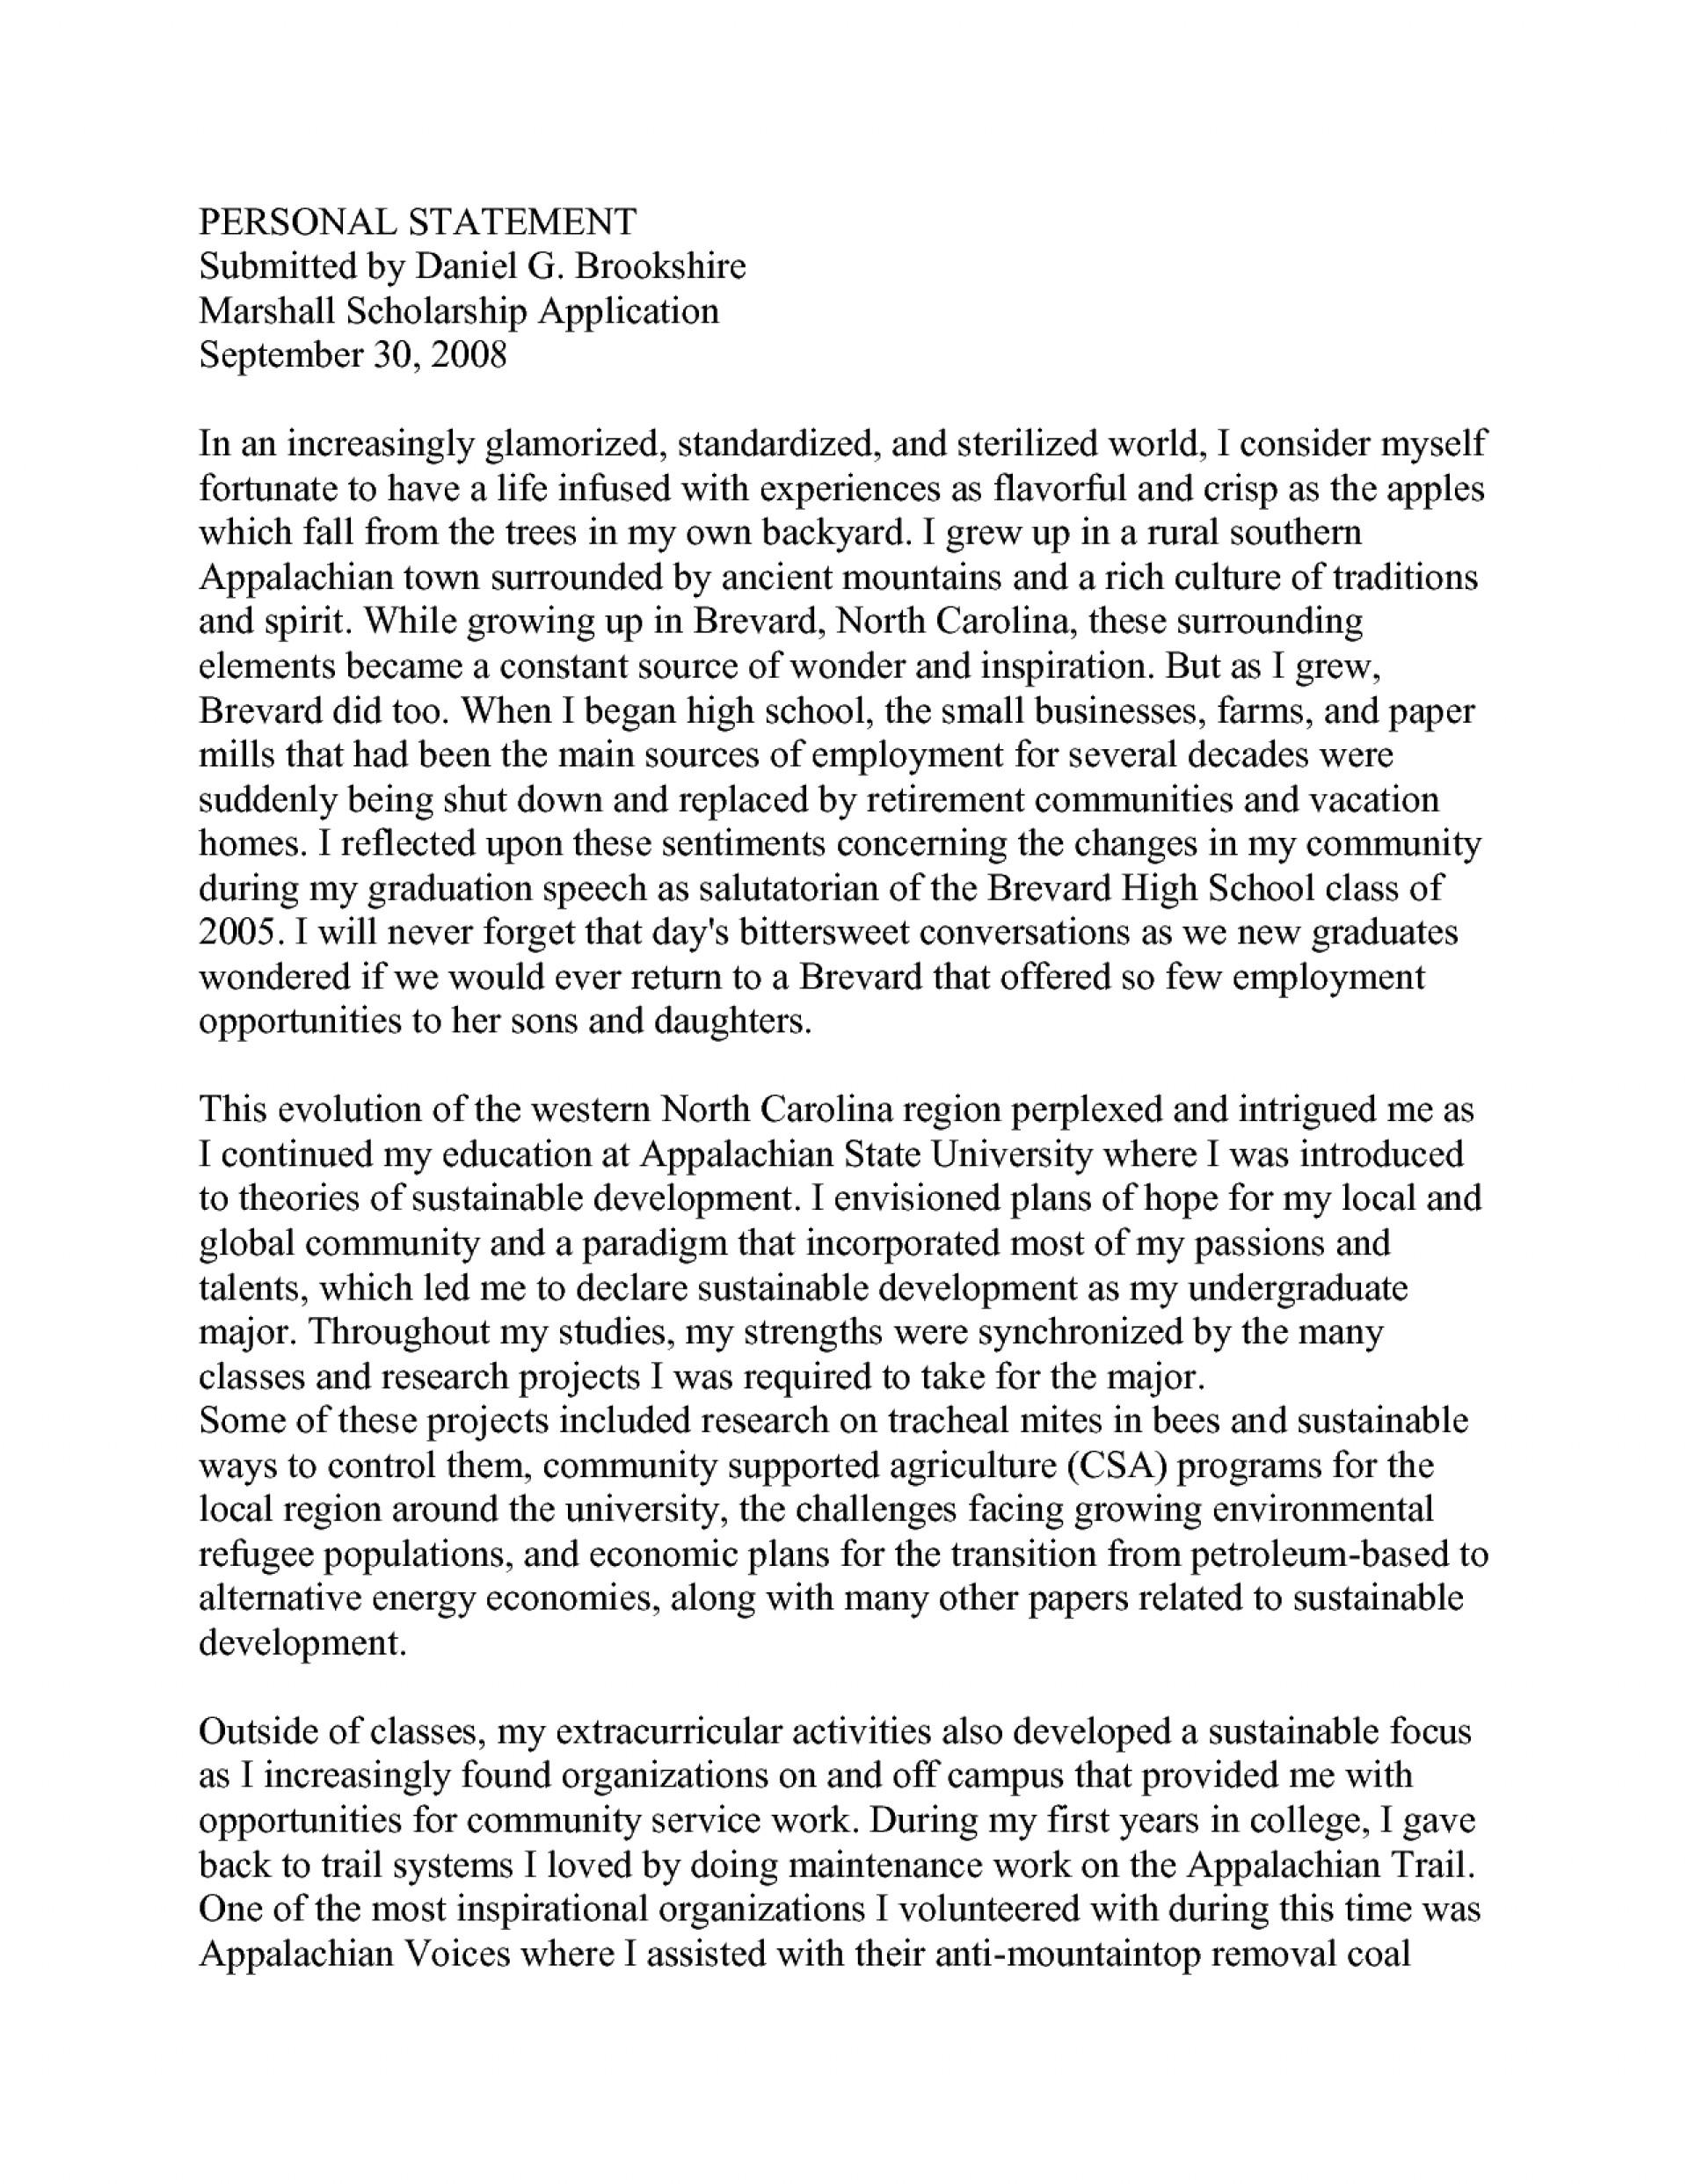 004 Scholarship Personal Statement Template Nsvwiupr Essay Example Header Phenomenal Format Mla Paper Margins 1920